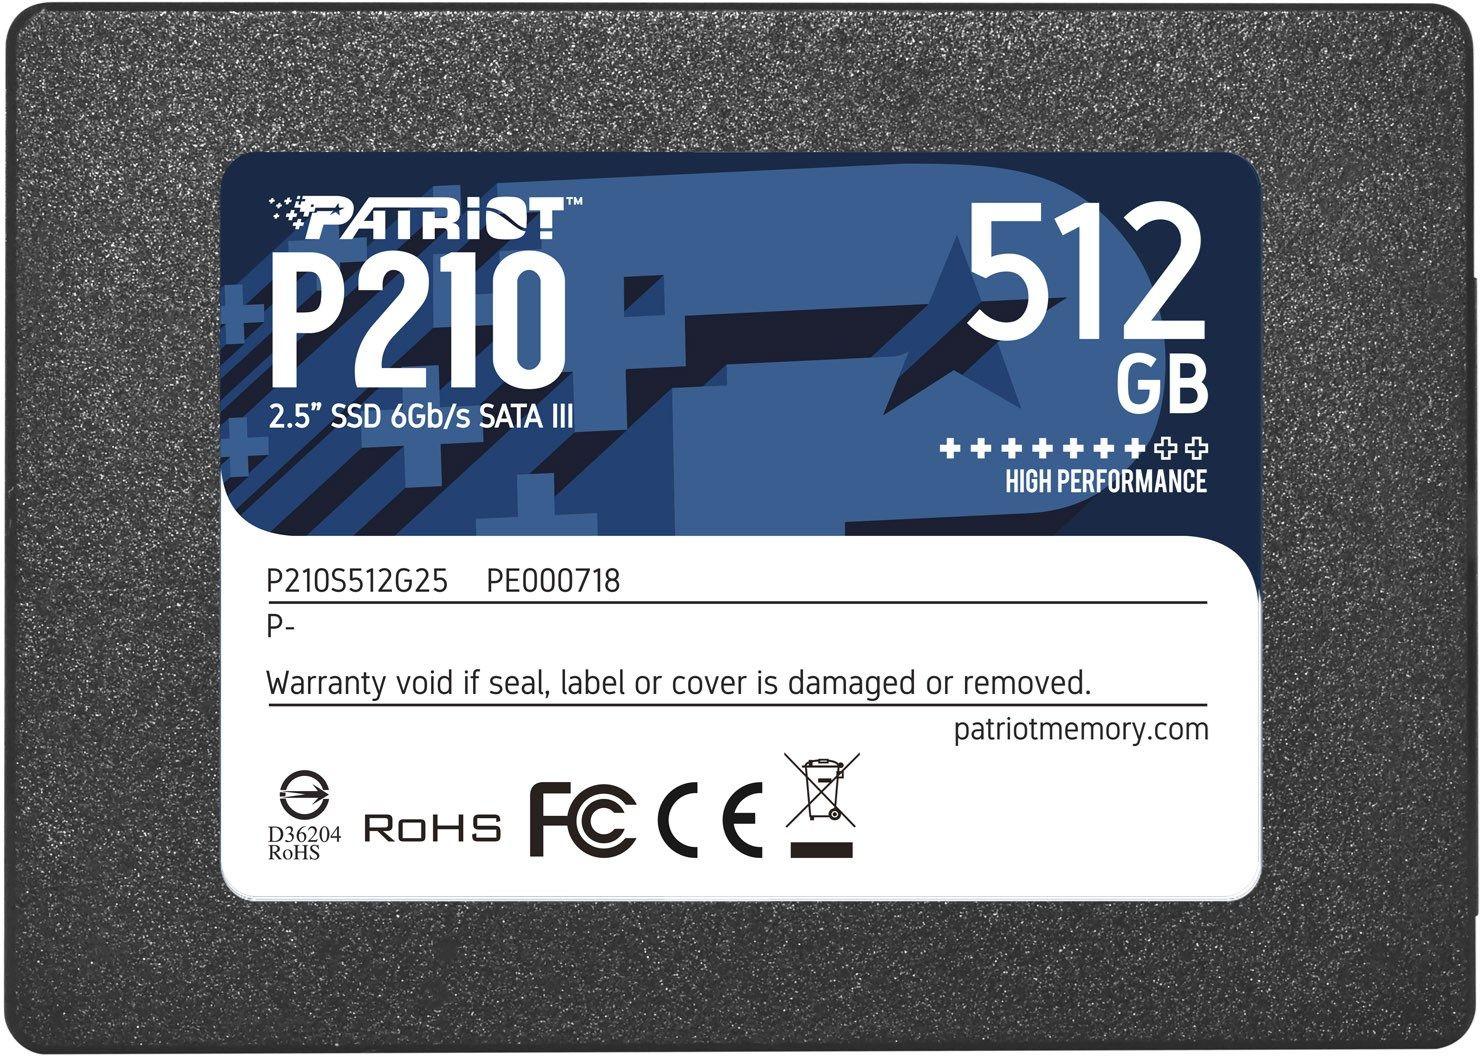 "Patriot Memory P210 2.5"" 512 GB SATA III"